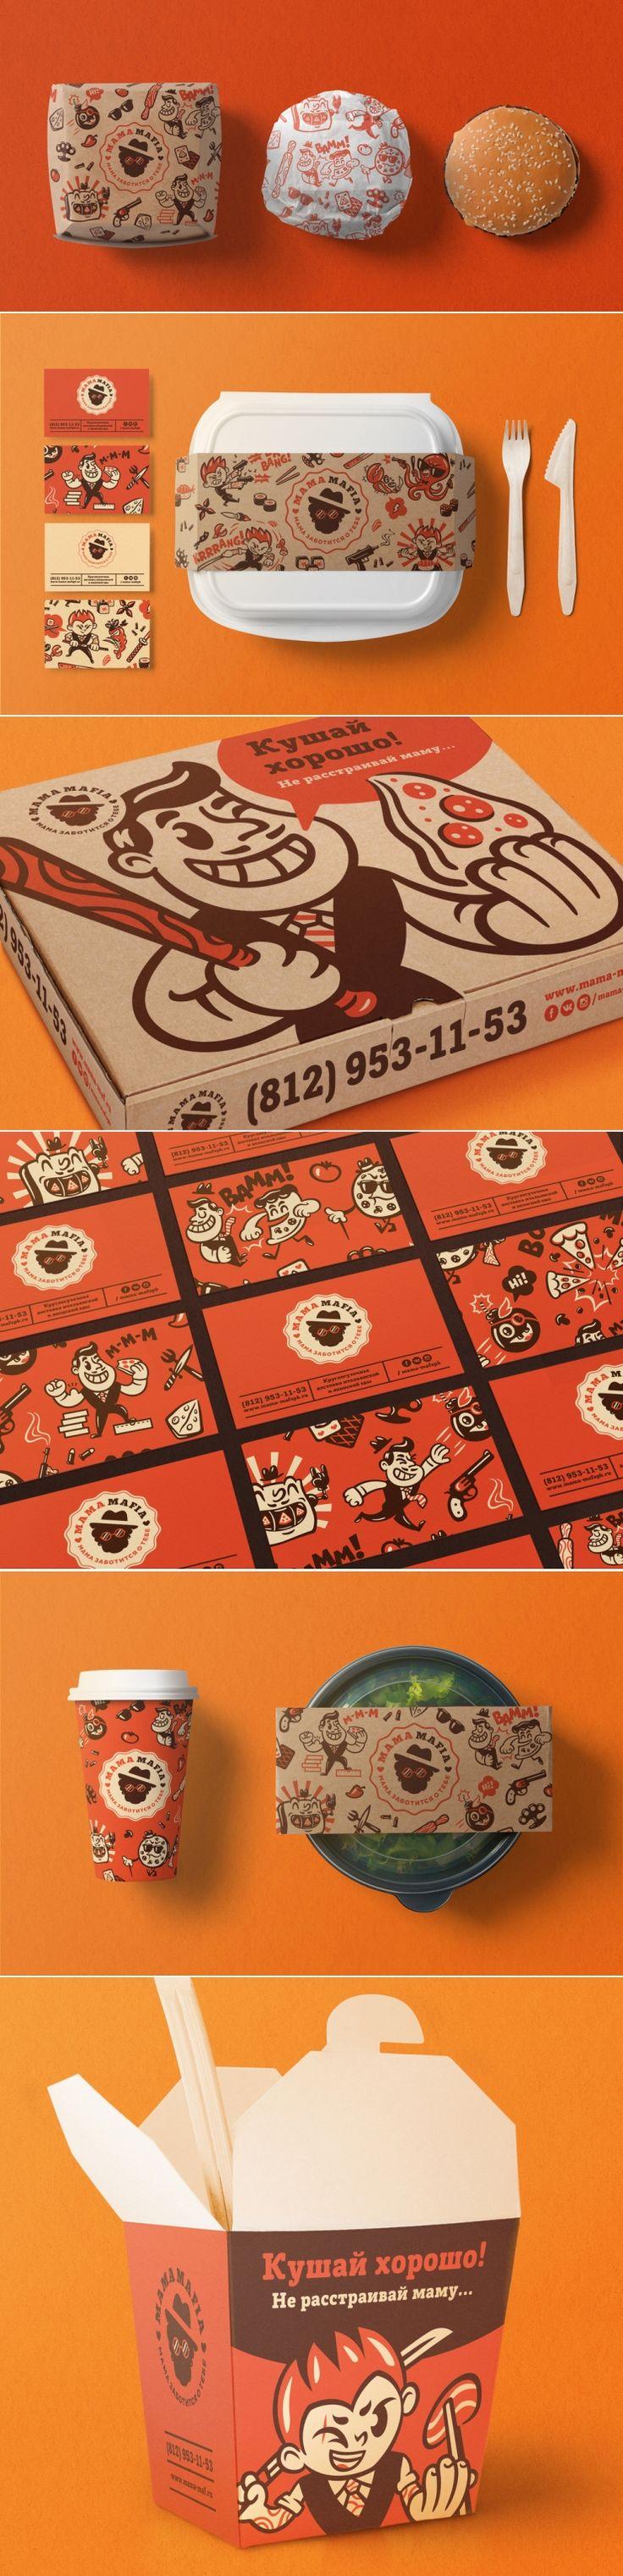 Mama Mafia — The Dieline | Packaging & Branding Design & Innovation News